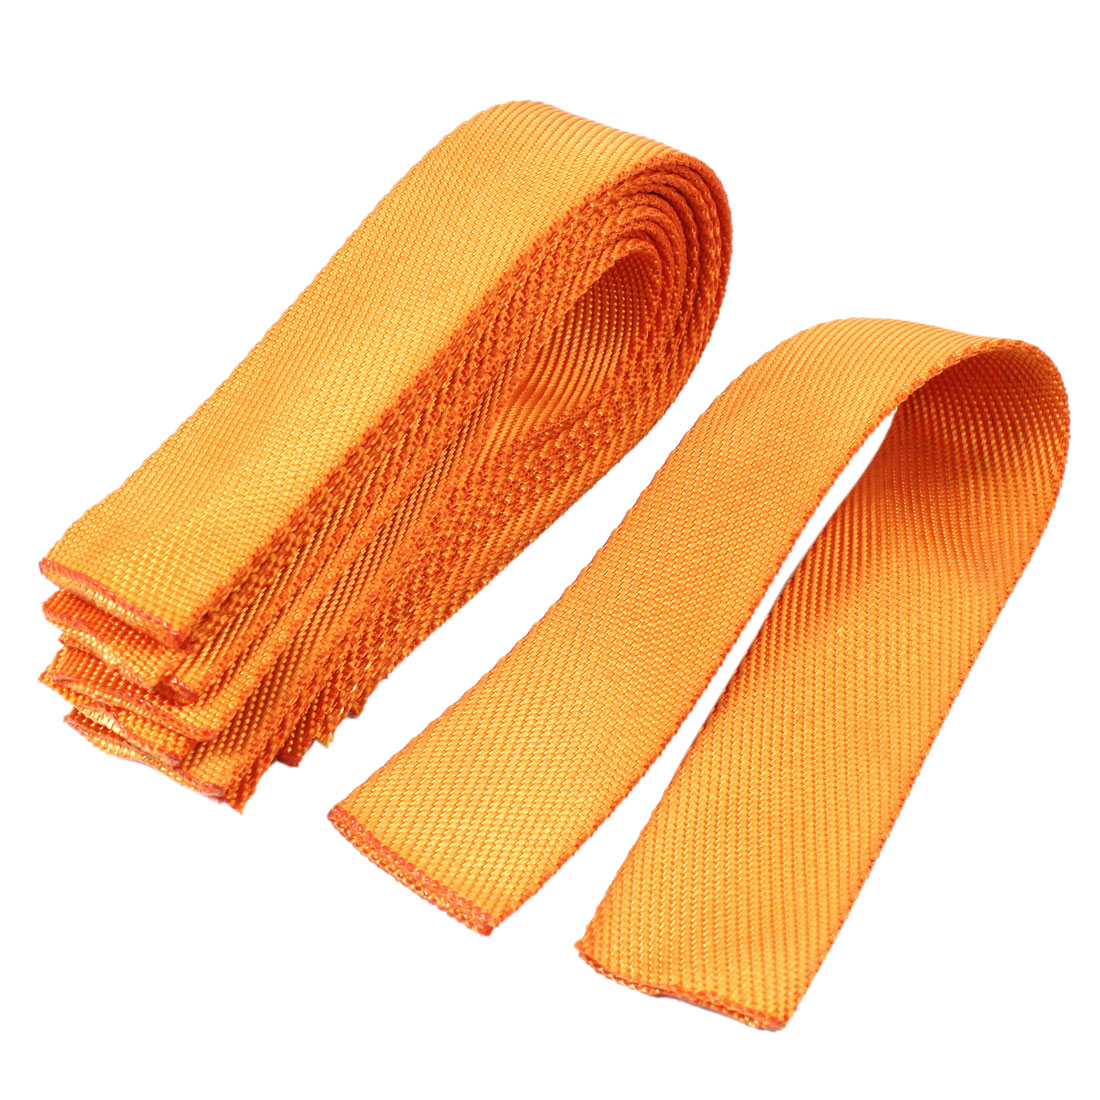 Sleeve Style 4.2cm Width Orange Nylon Bundle Strap Webbing Protector 10pcs